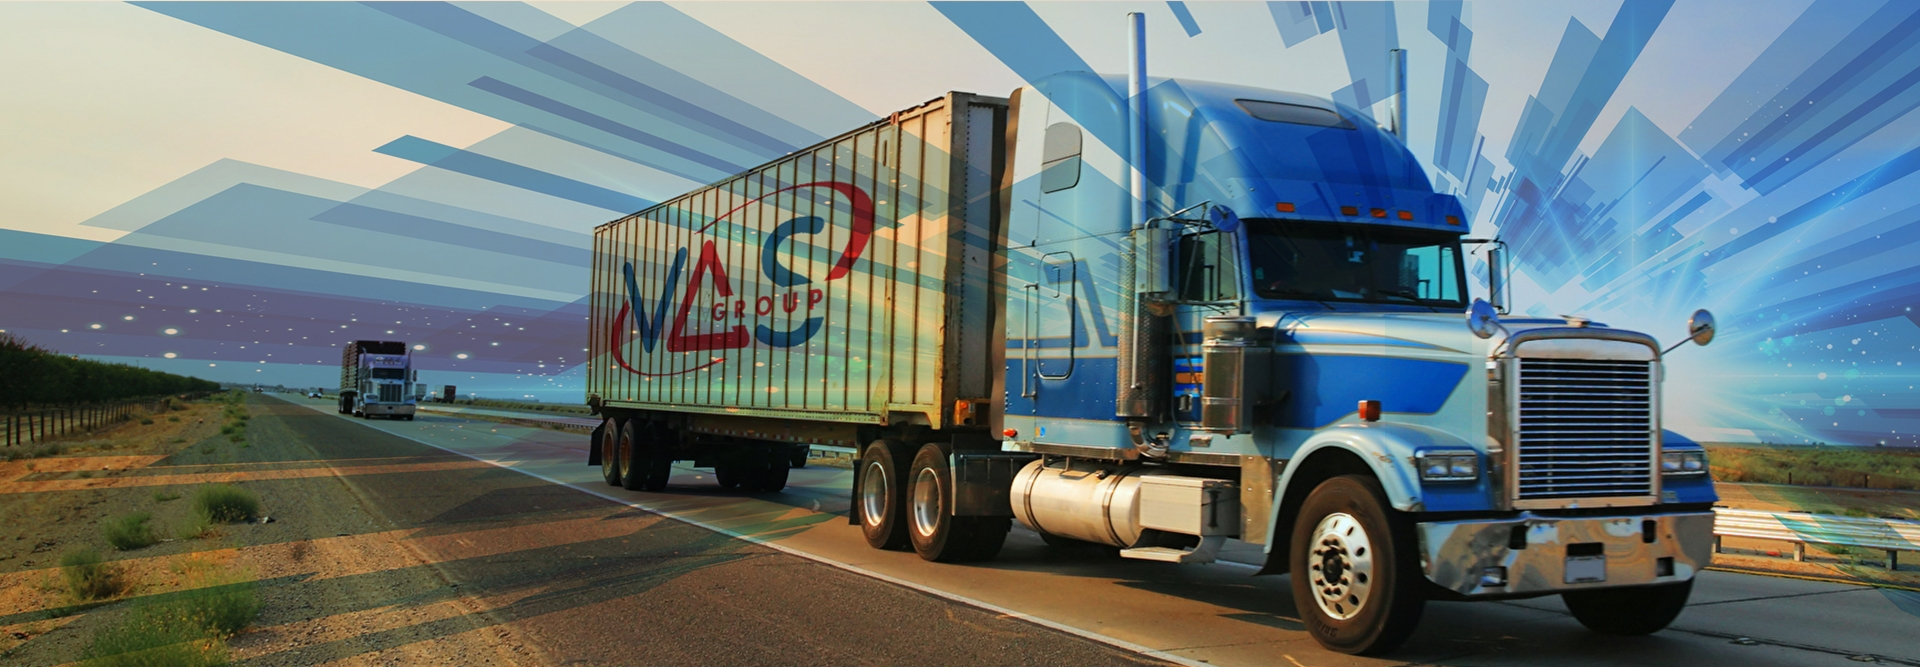 Import & distribution